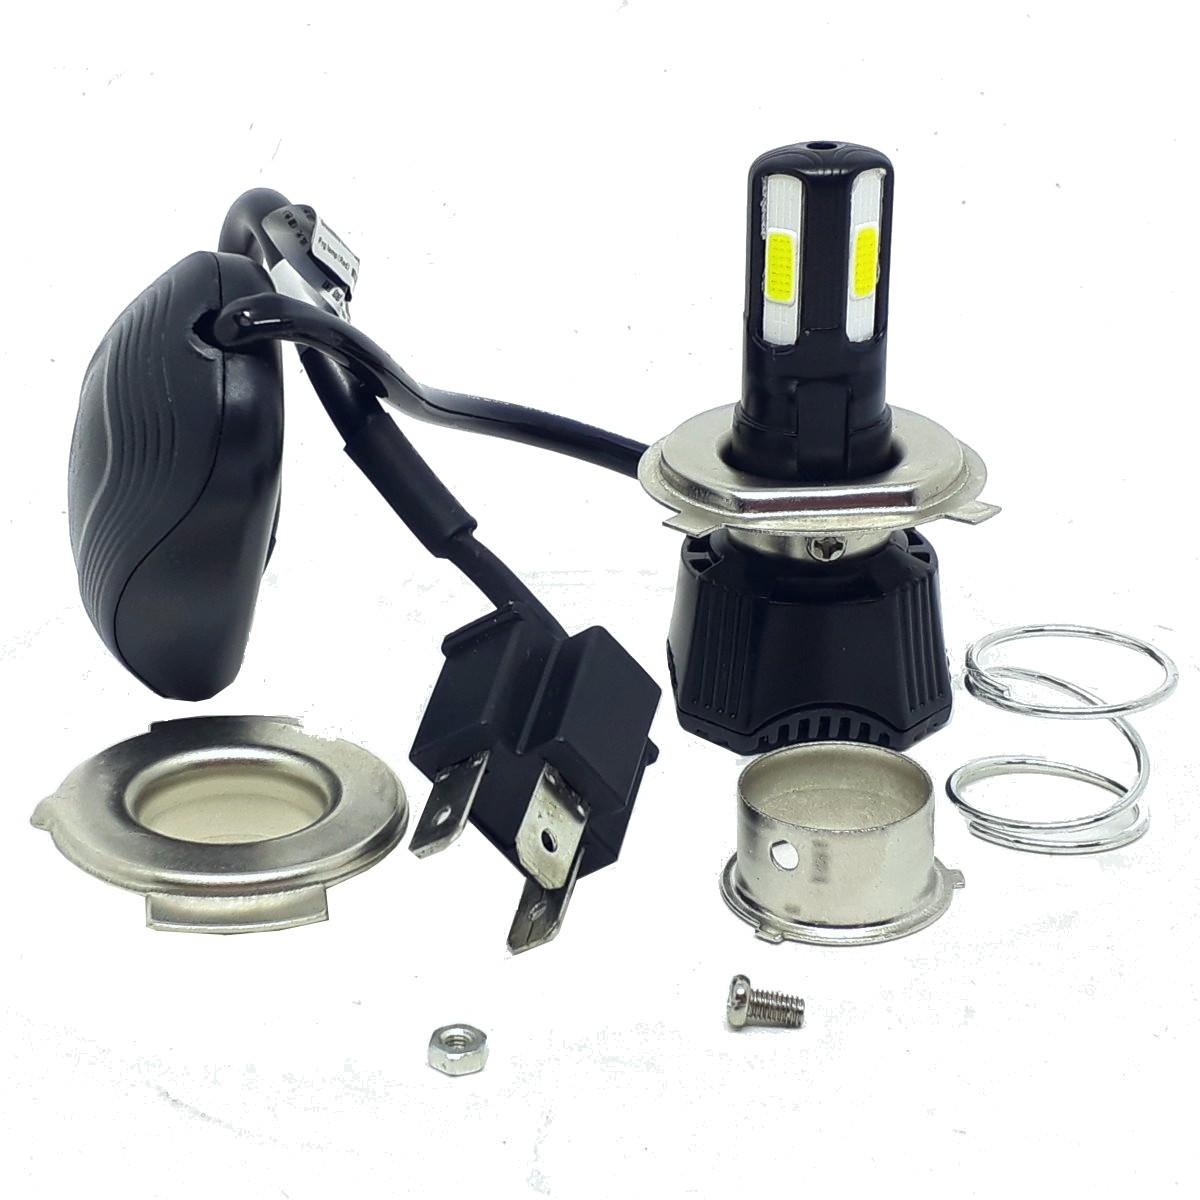 LAMPADA DE LED TMAC P/ MOTO FAROL H4 [42W] 4 LEDs 4600 LUMENS COM REATOR LED007